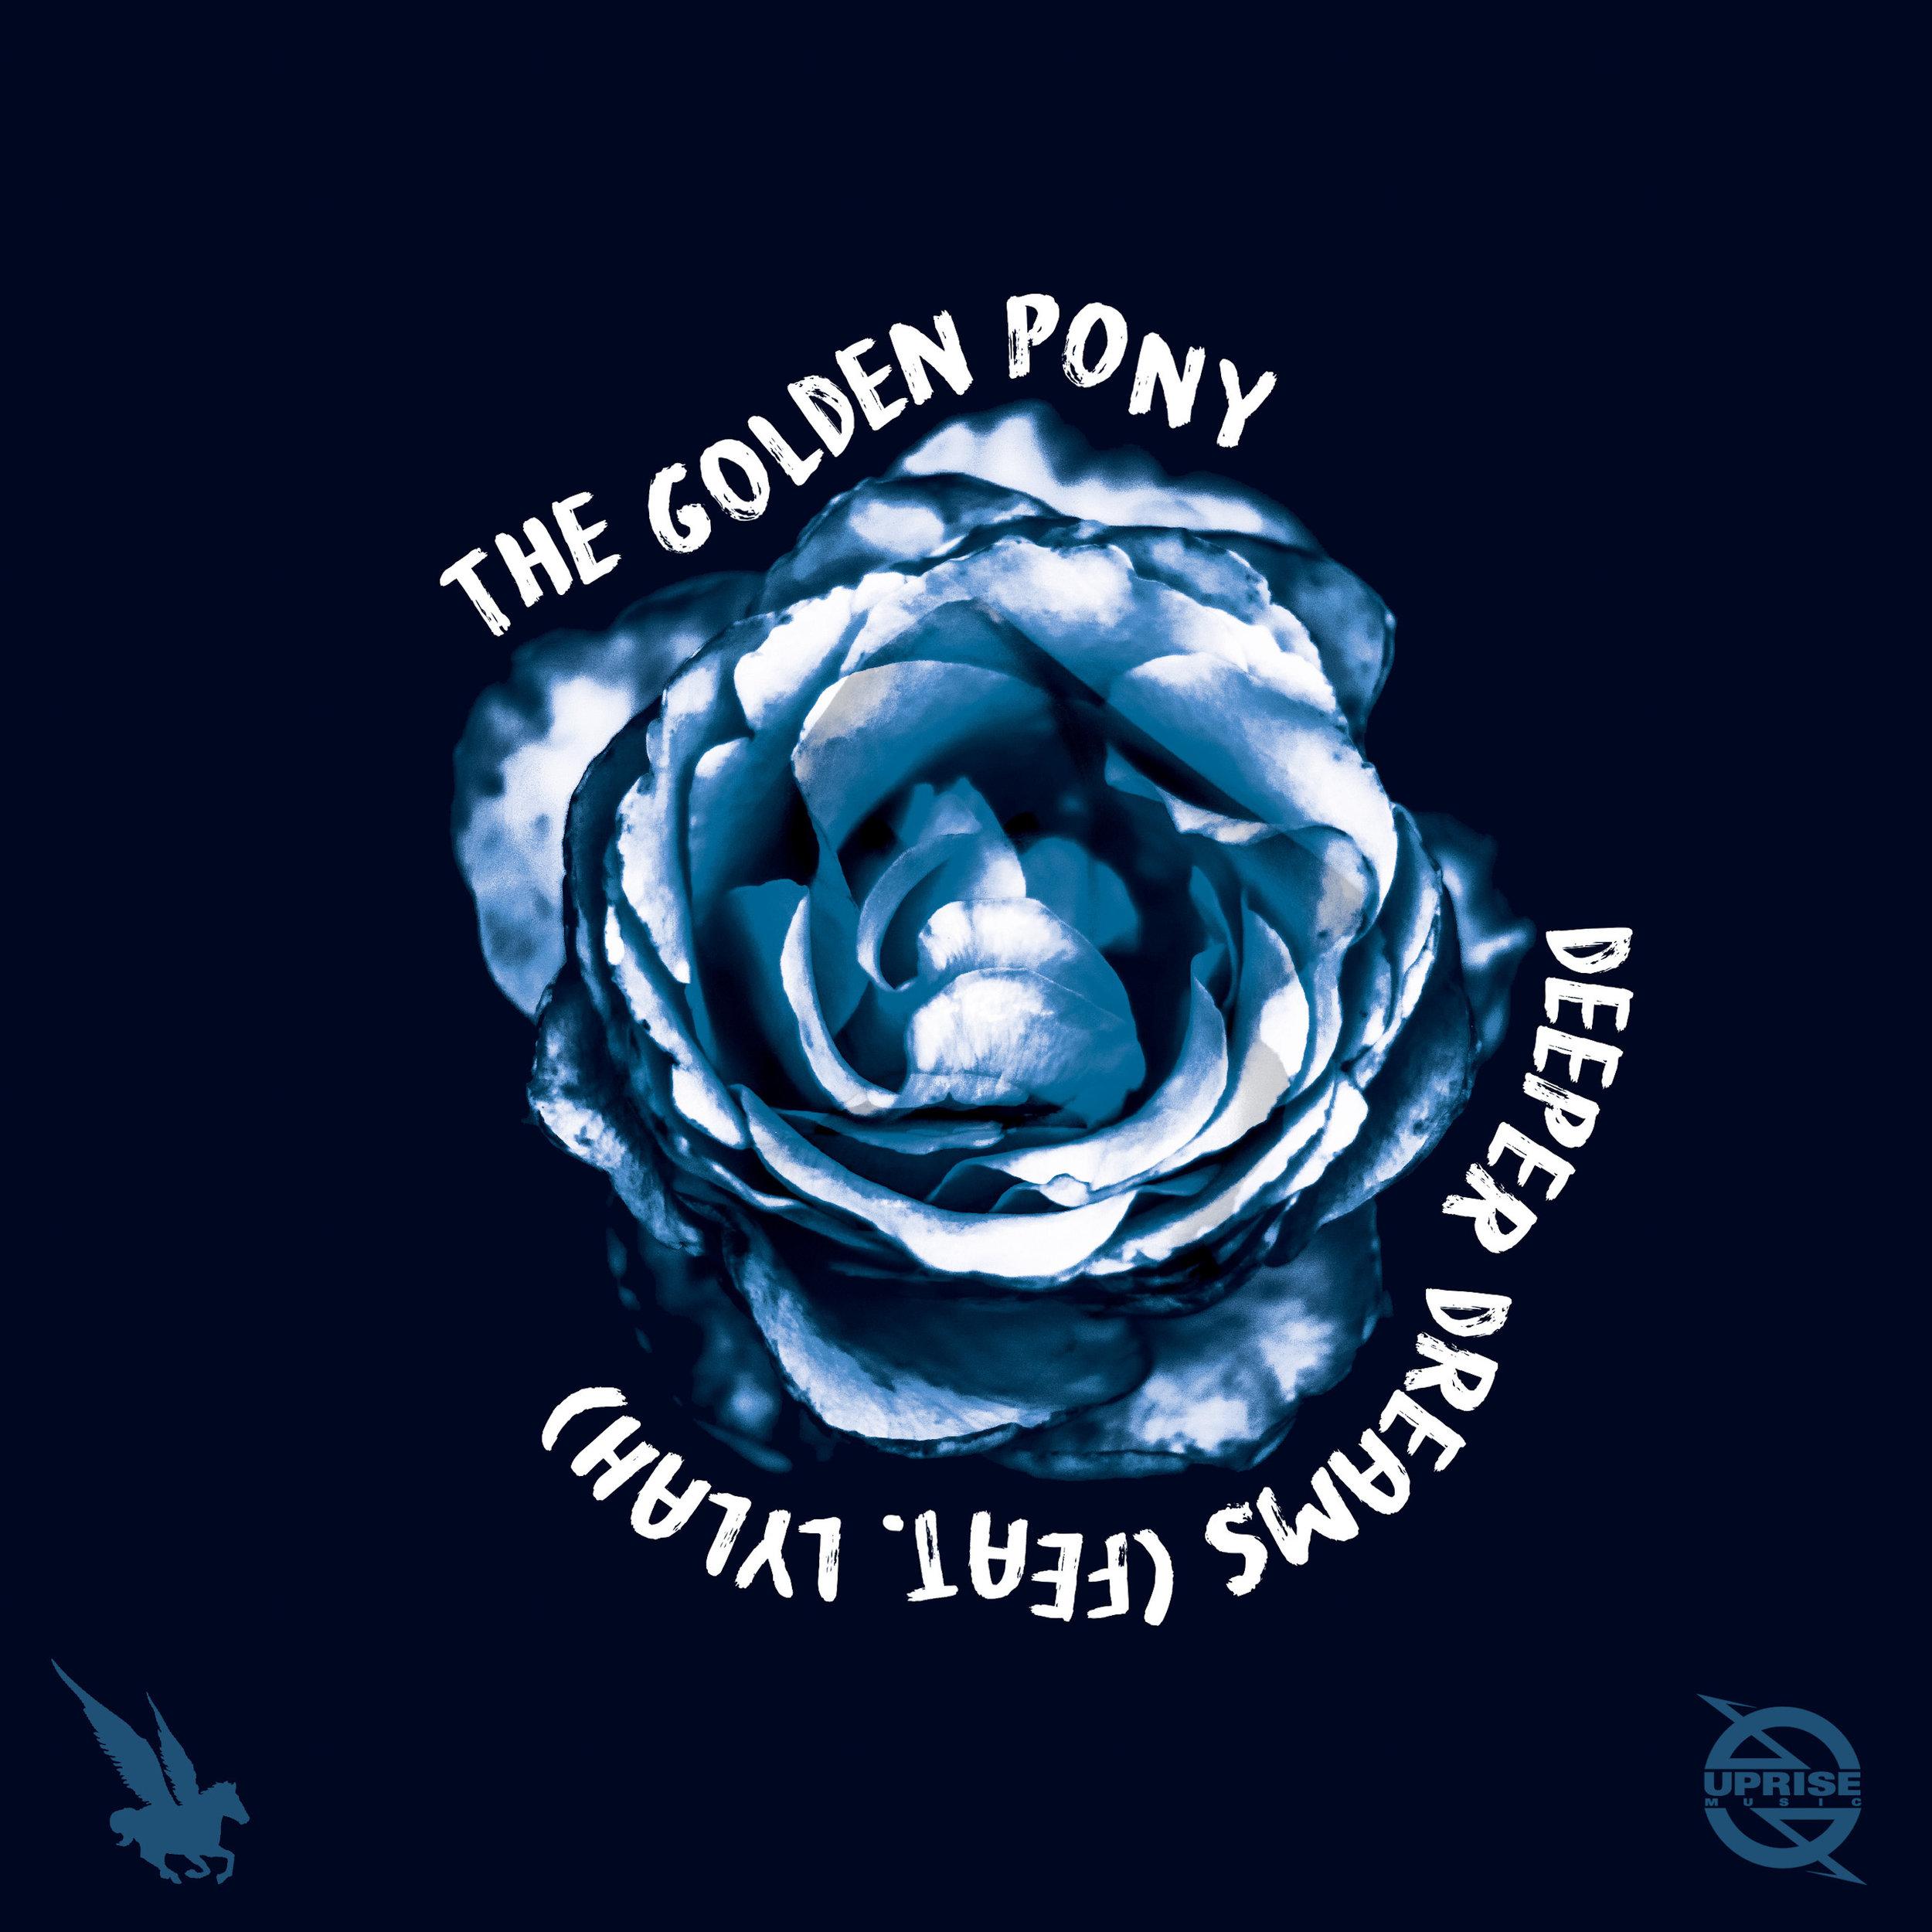 The Golden Pony - Deeper Dreams (feat. Lyrah)